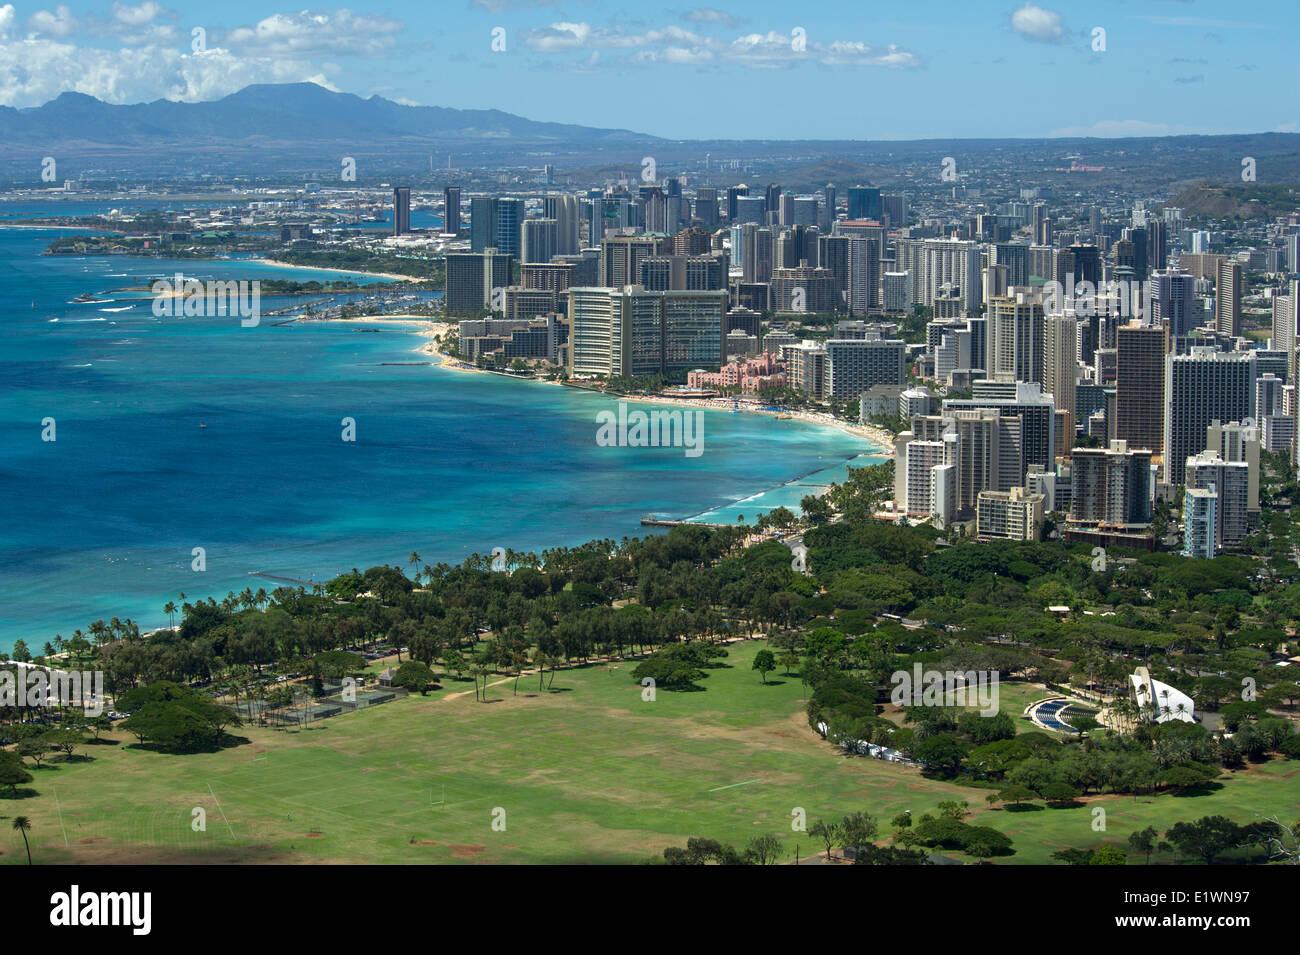 View of Waikiki tourist area of Honolulu from Diamond Head mountain - Stock Image